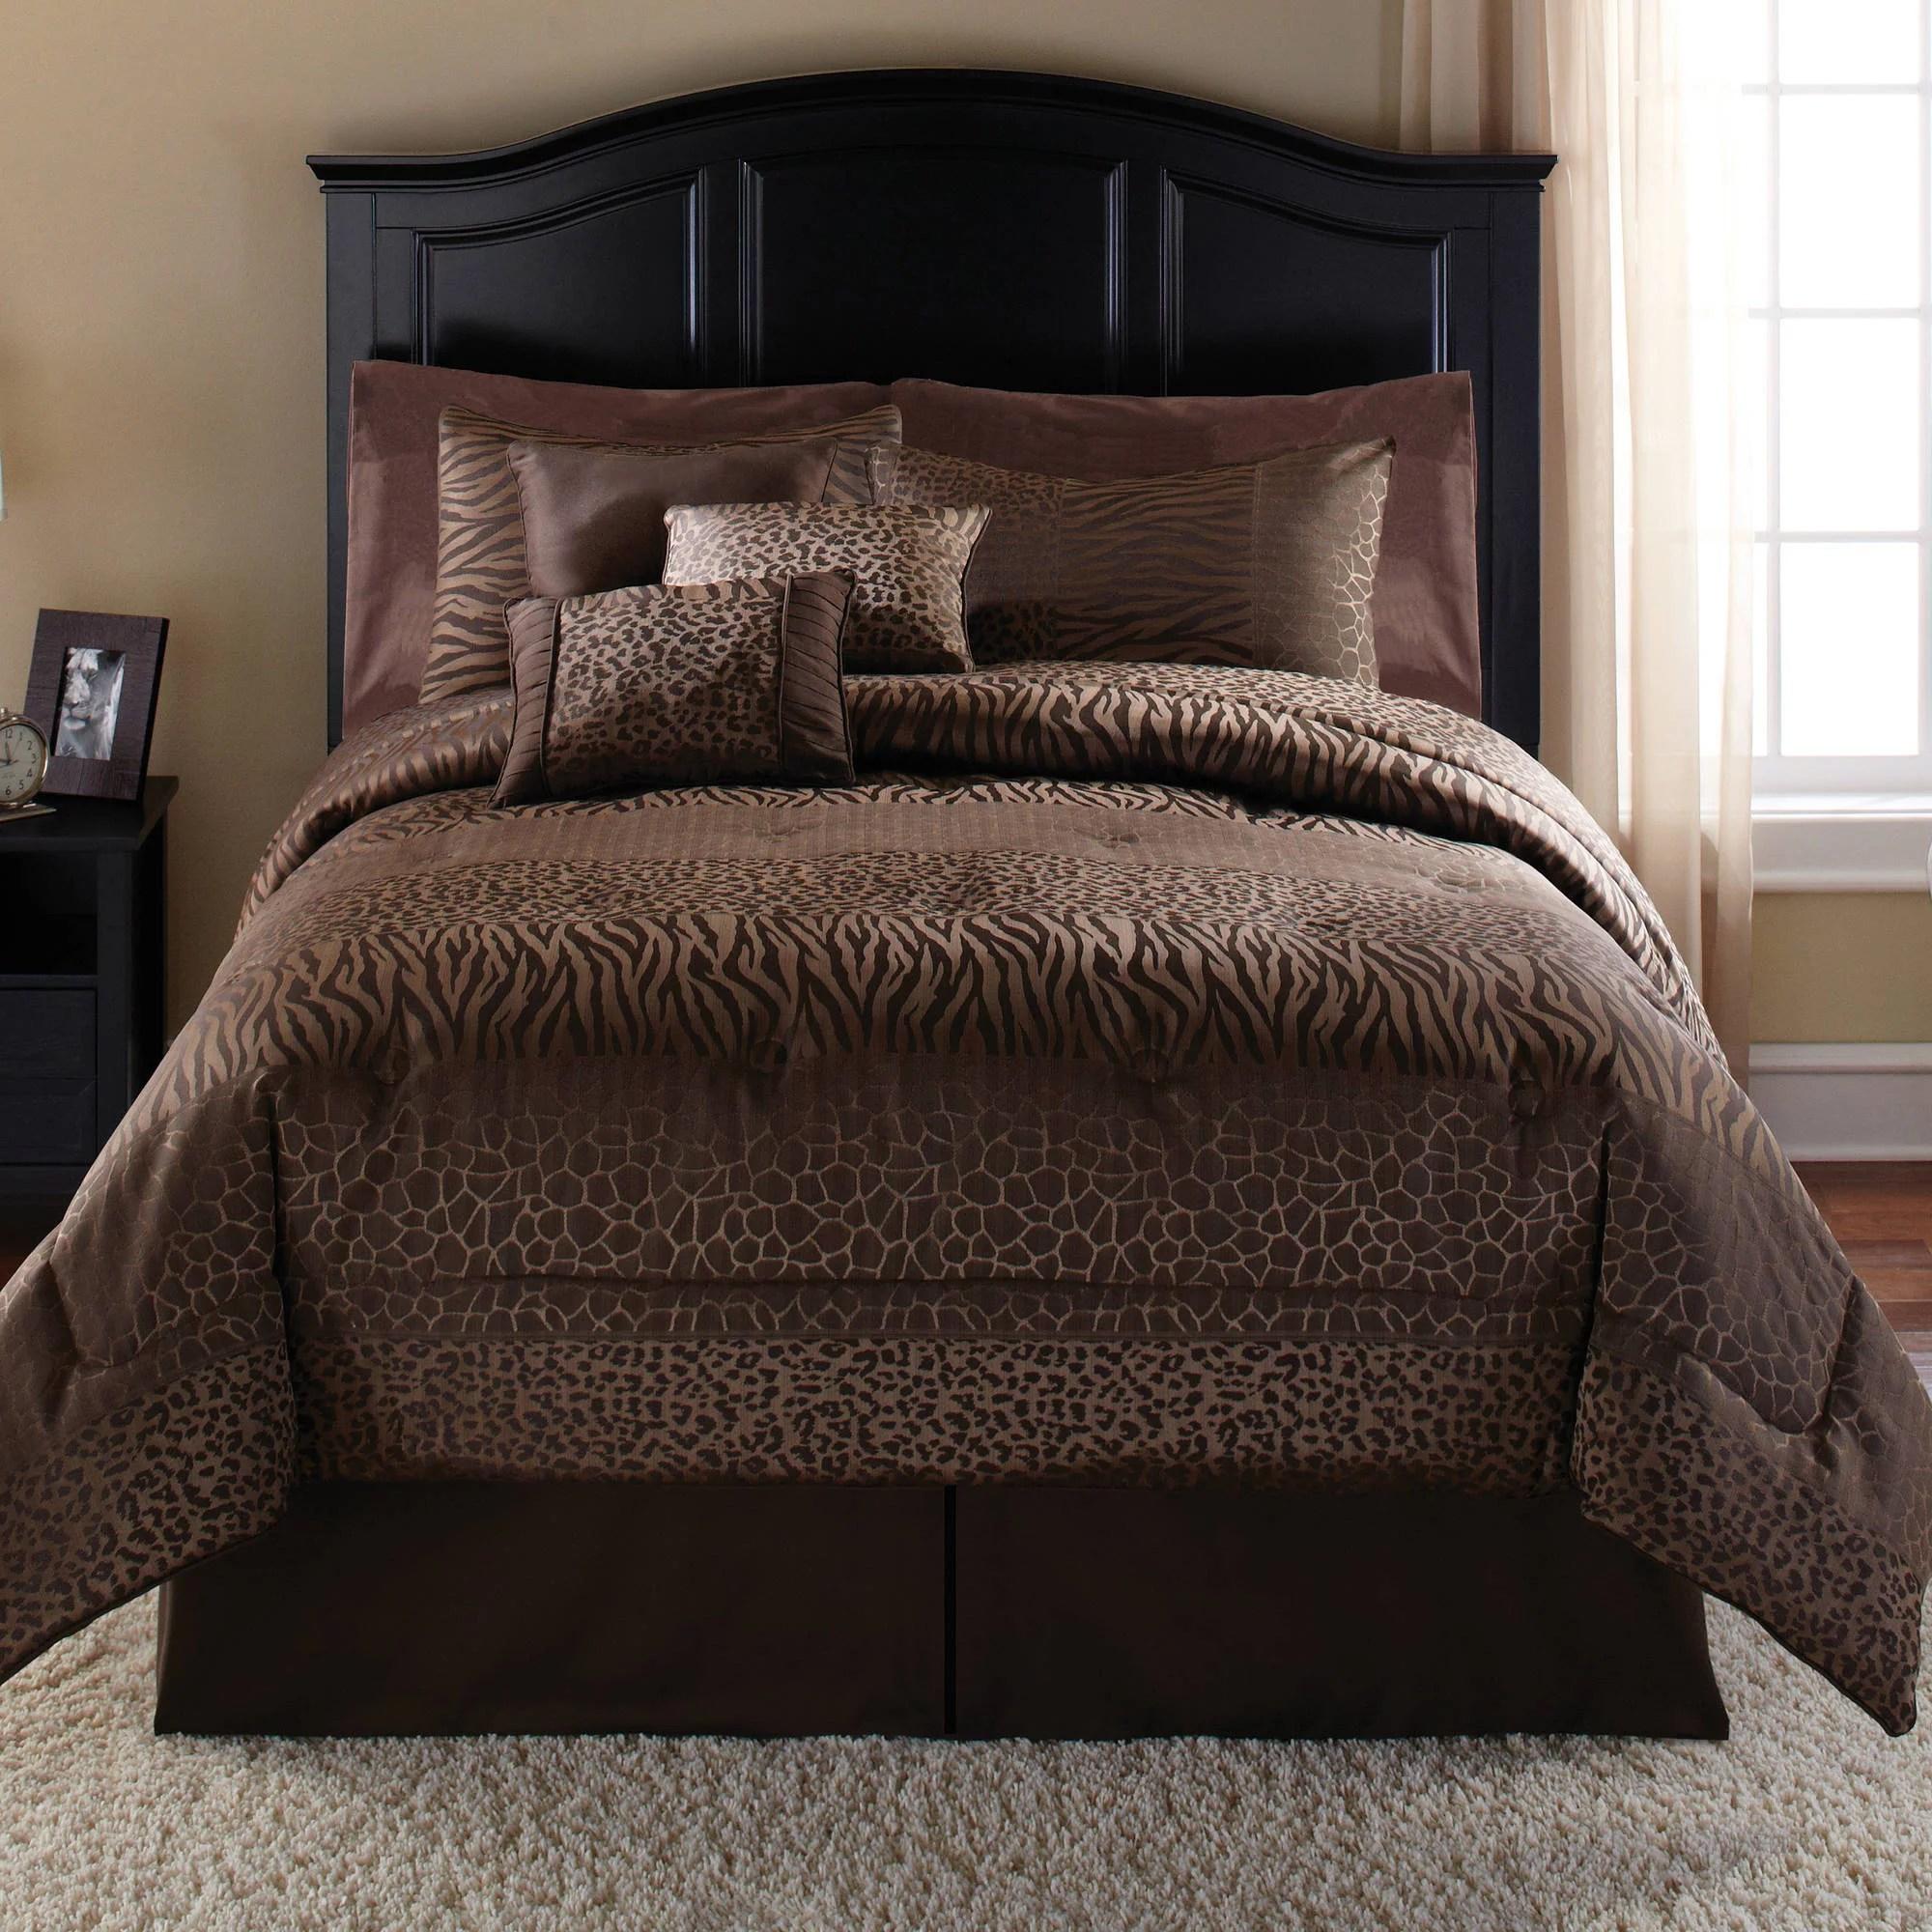 Mainstays Safari 7 Piece Bedding Comforter Set Walmartcom